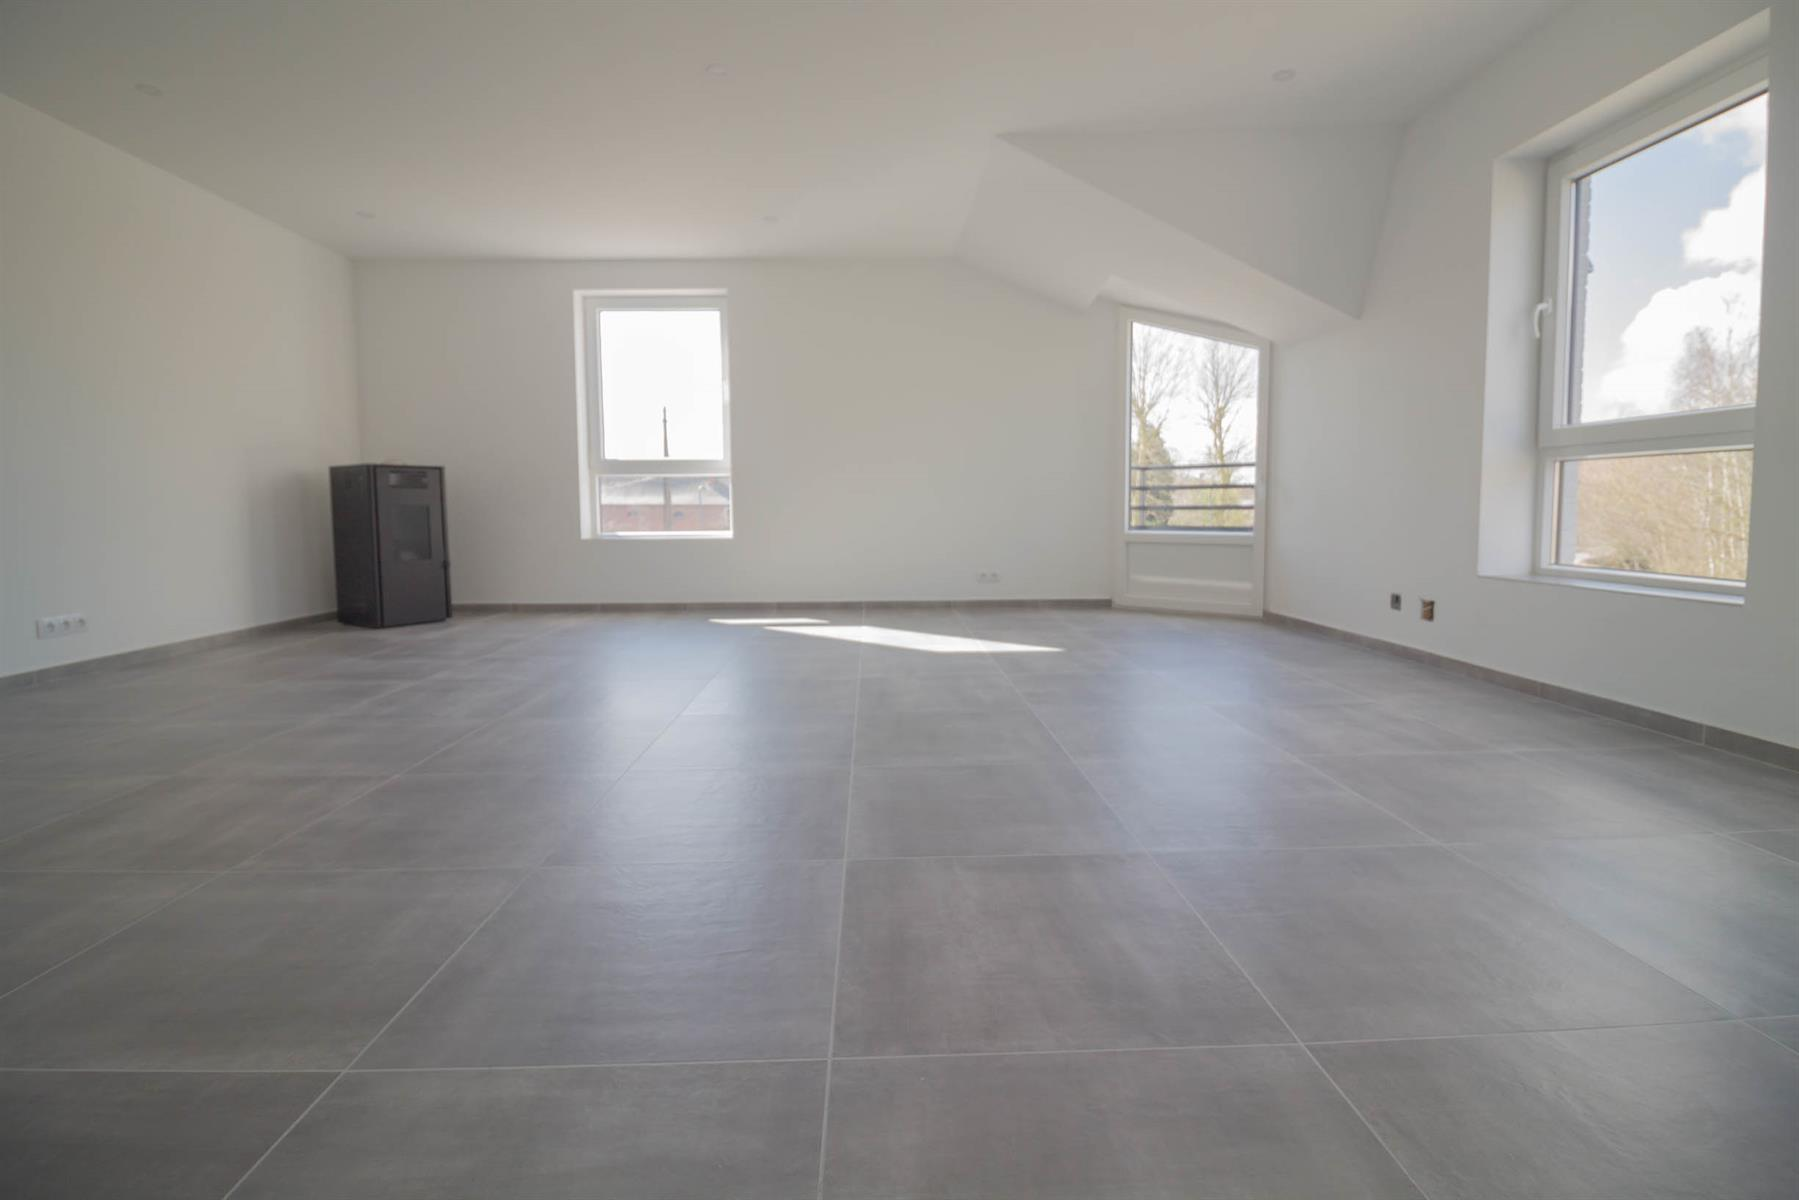 Appartement - Peissant - #4321179-3